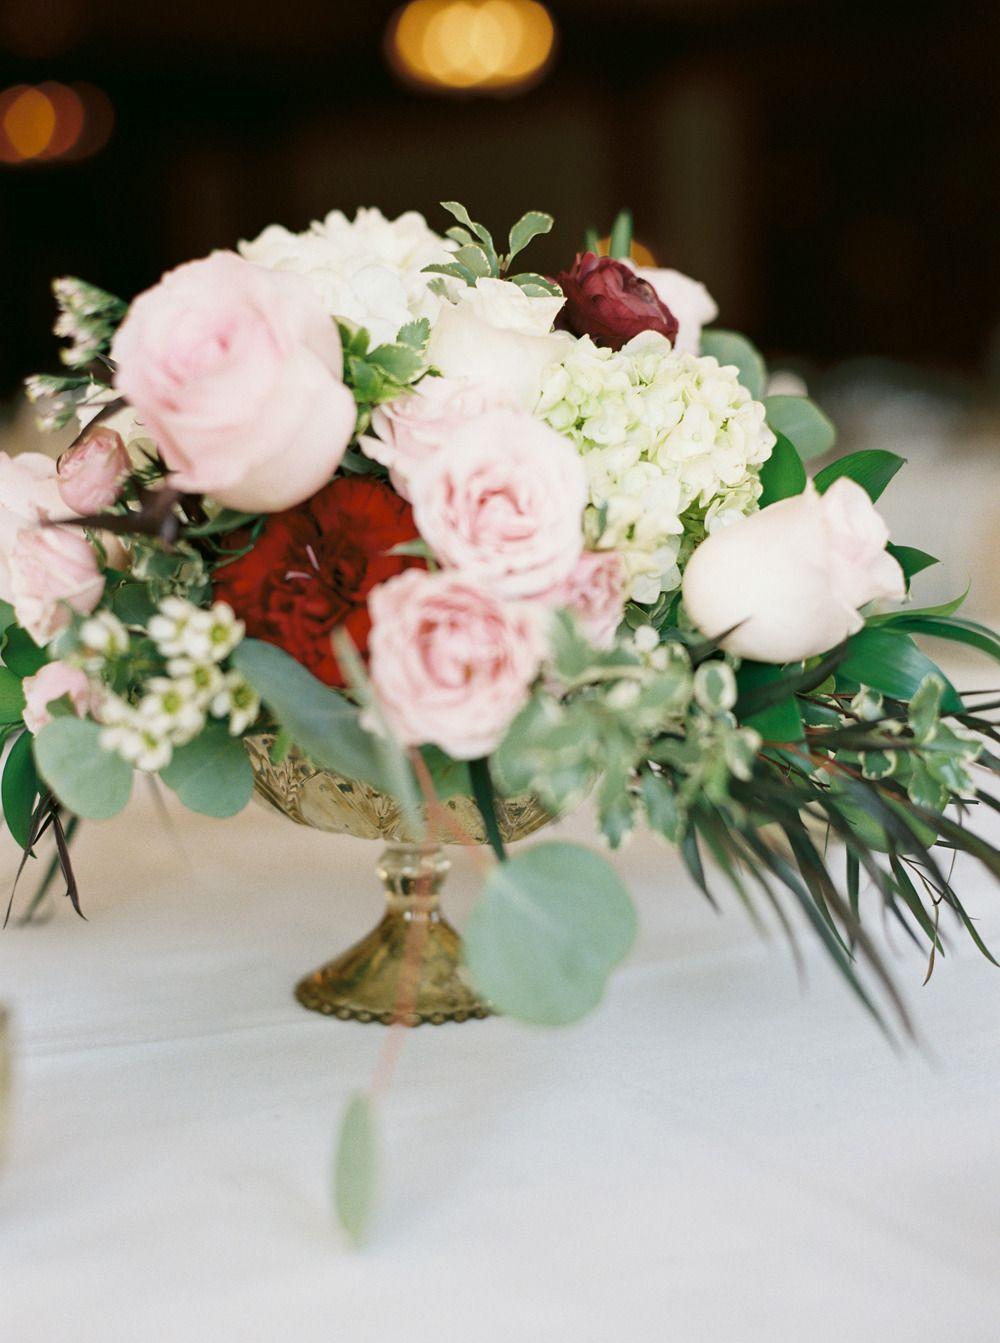 Favorite summer wedding moments to savor rose